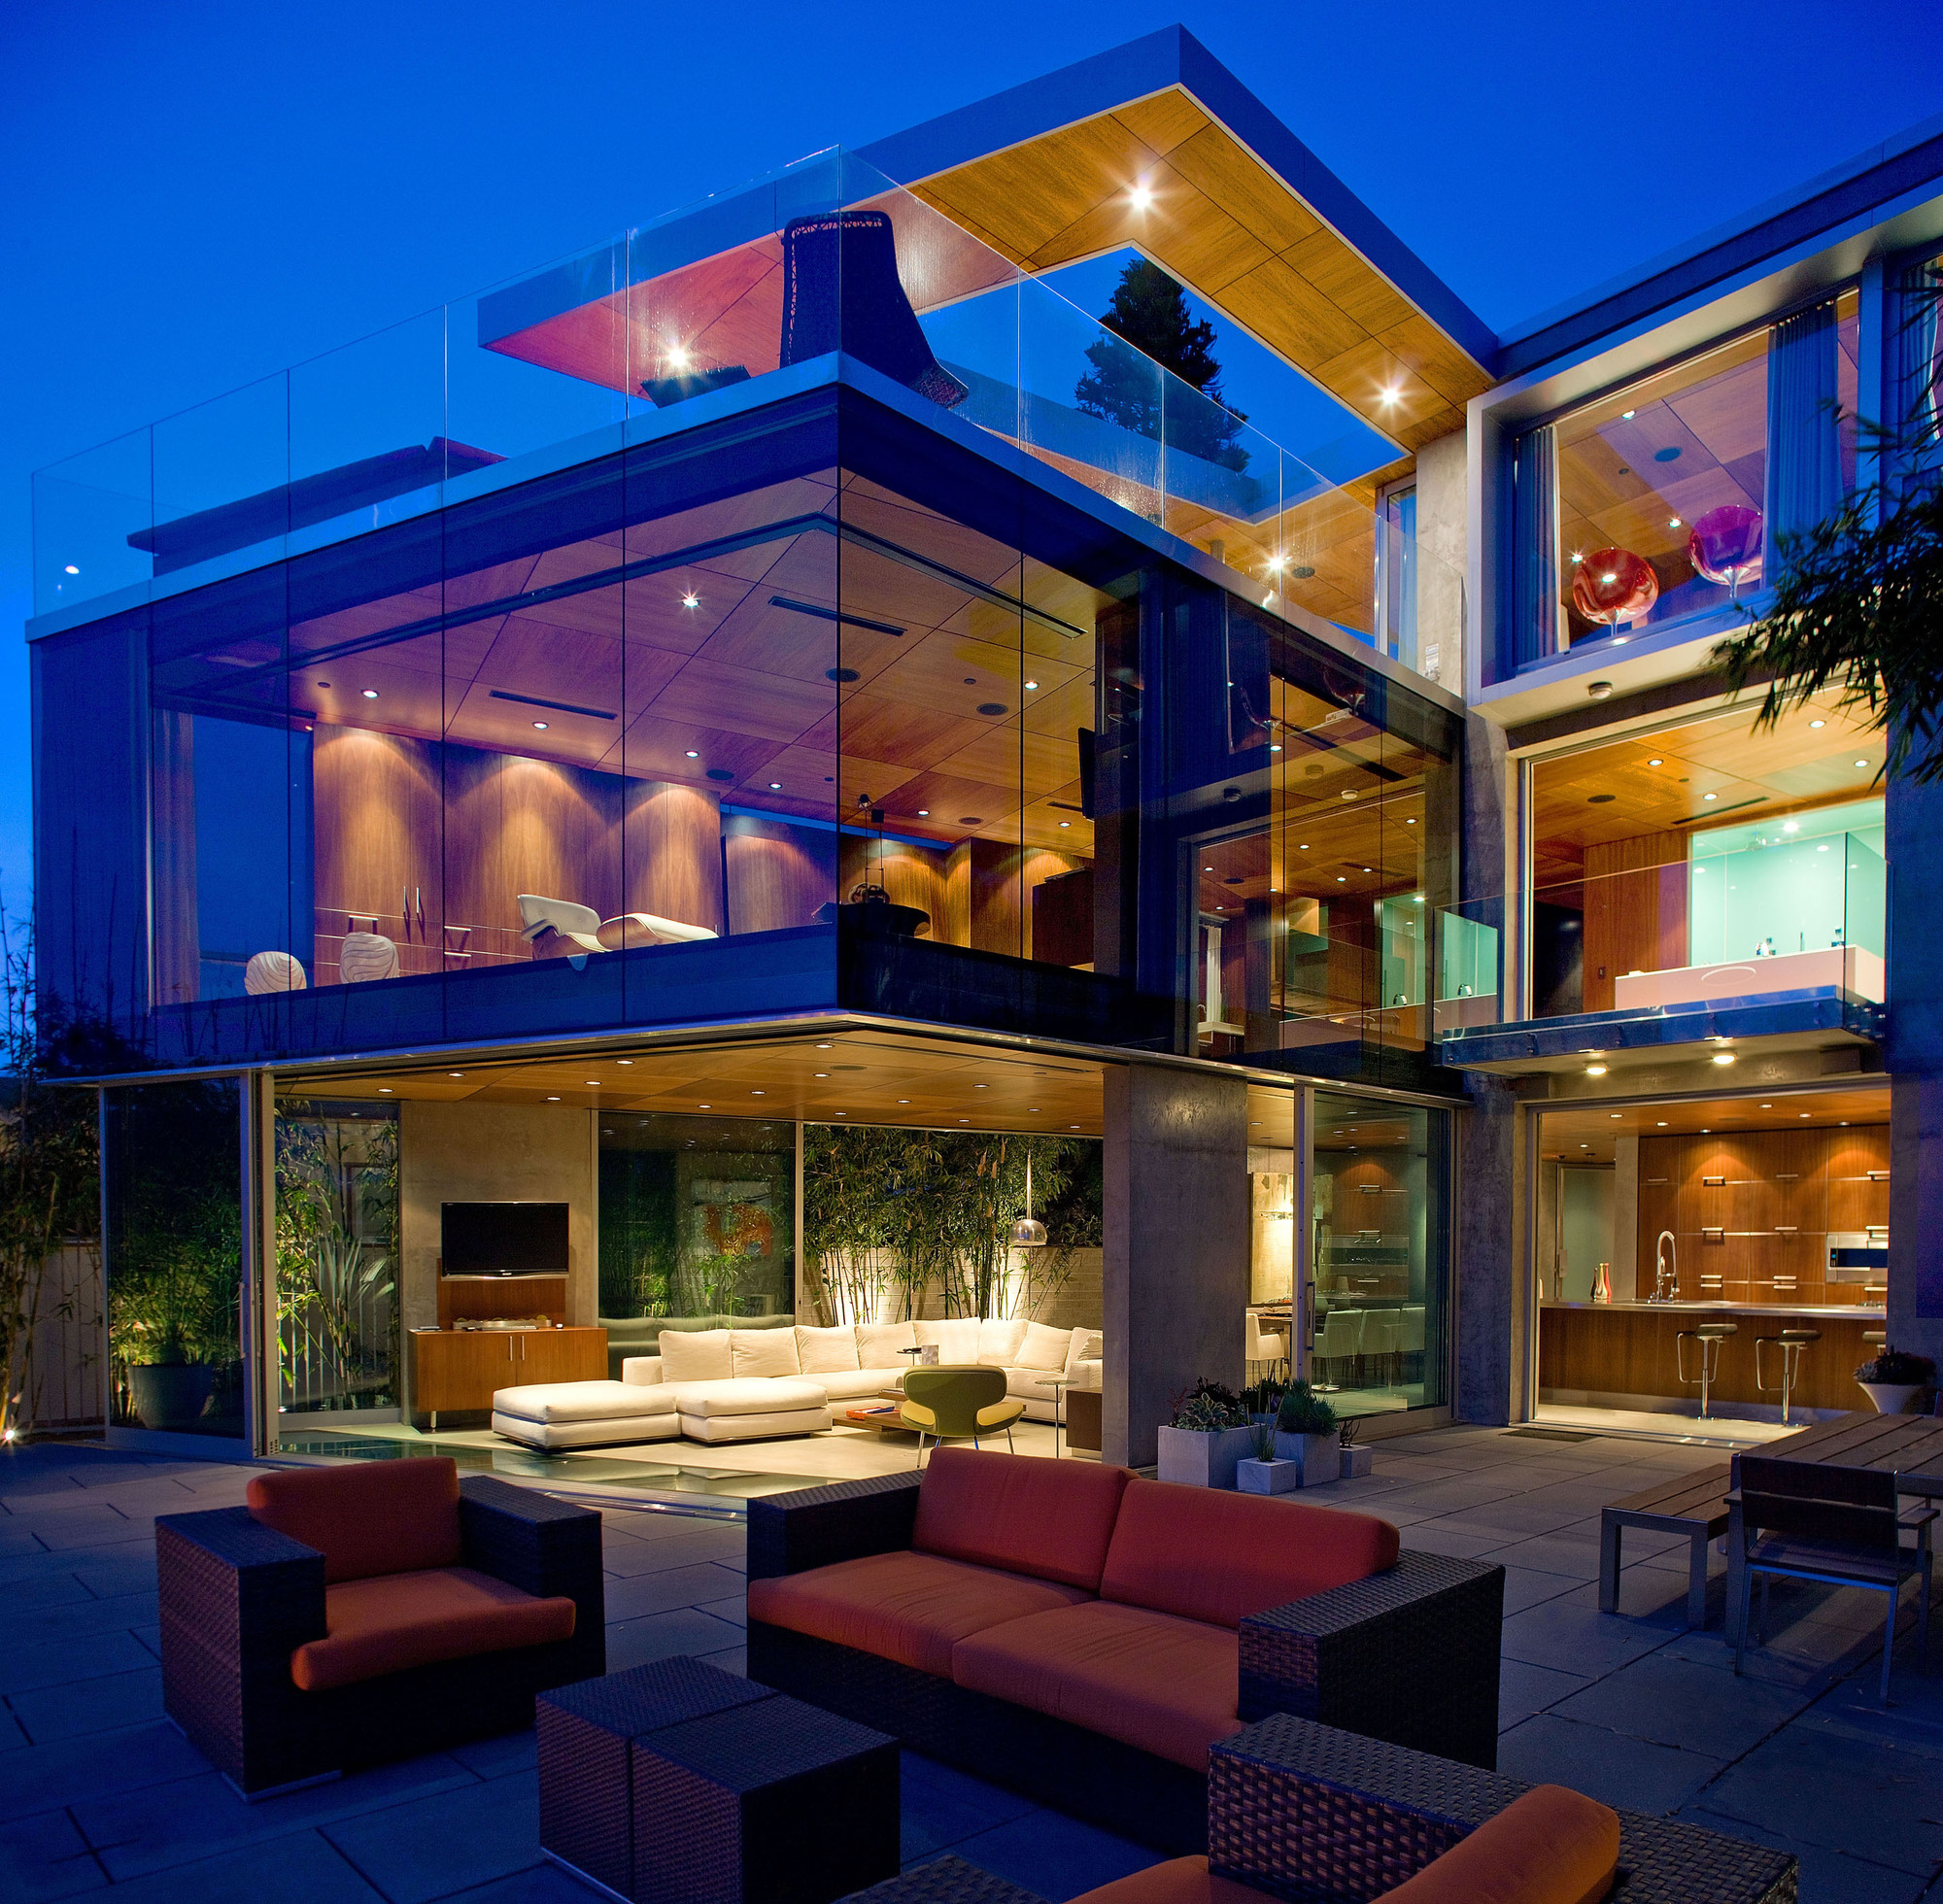 The Lemperle Residence / Jonathan Segal FAIA